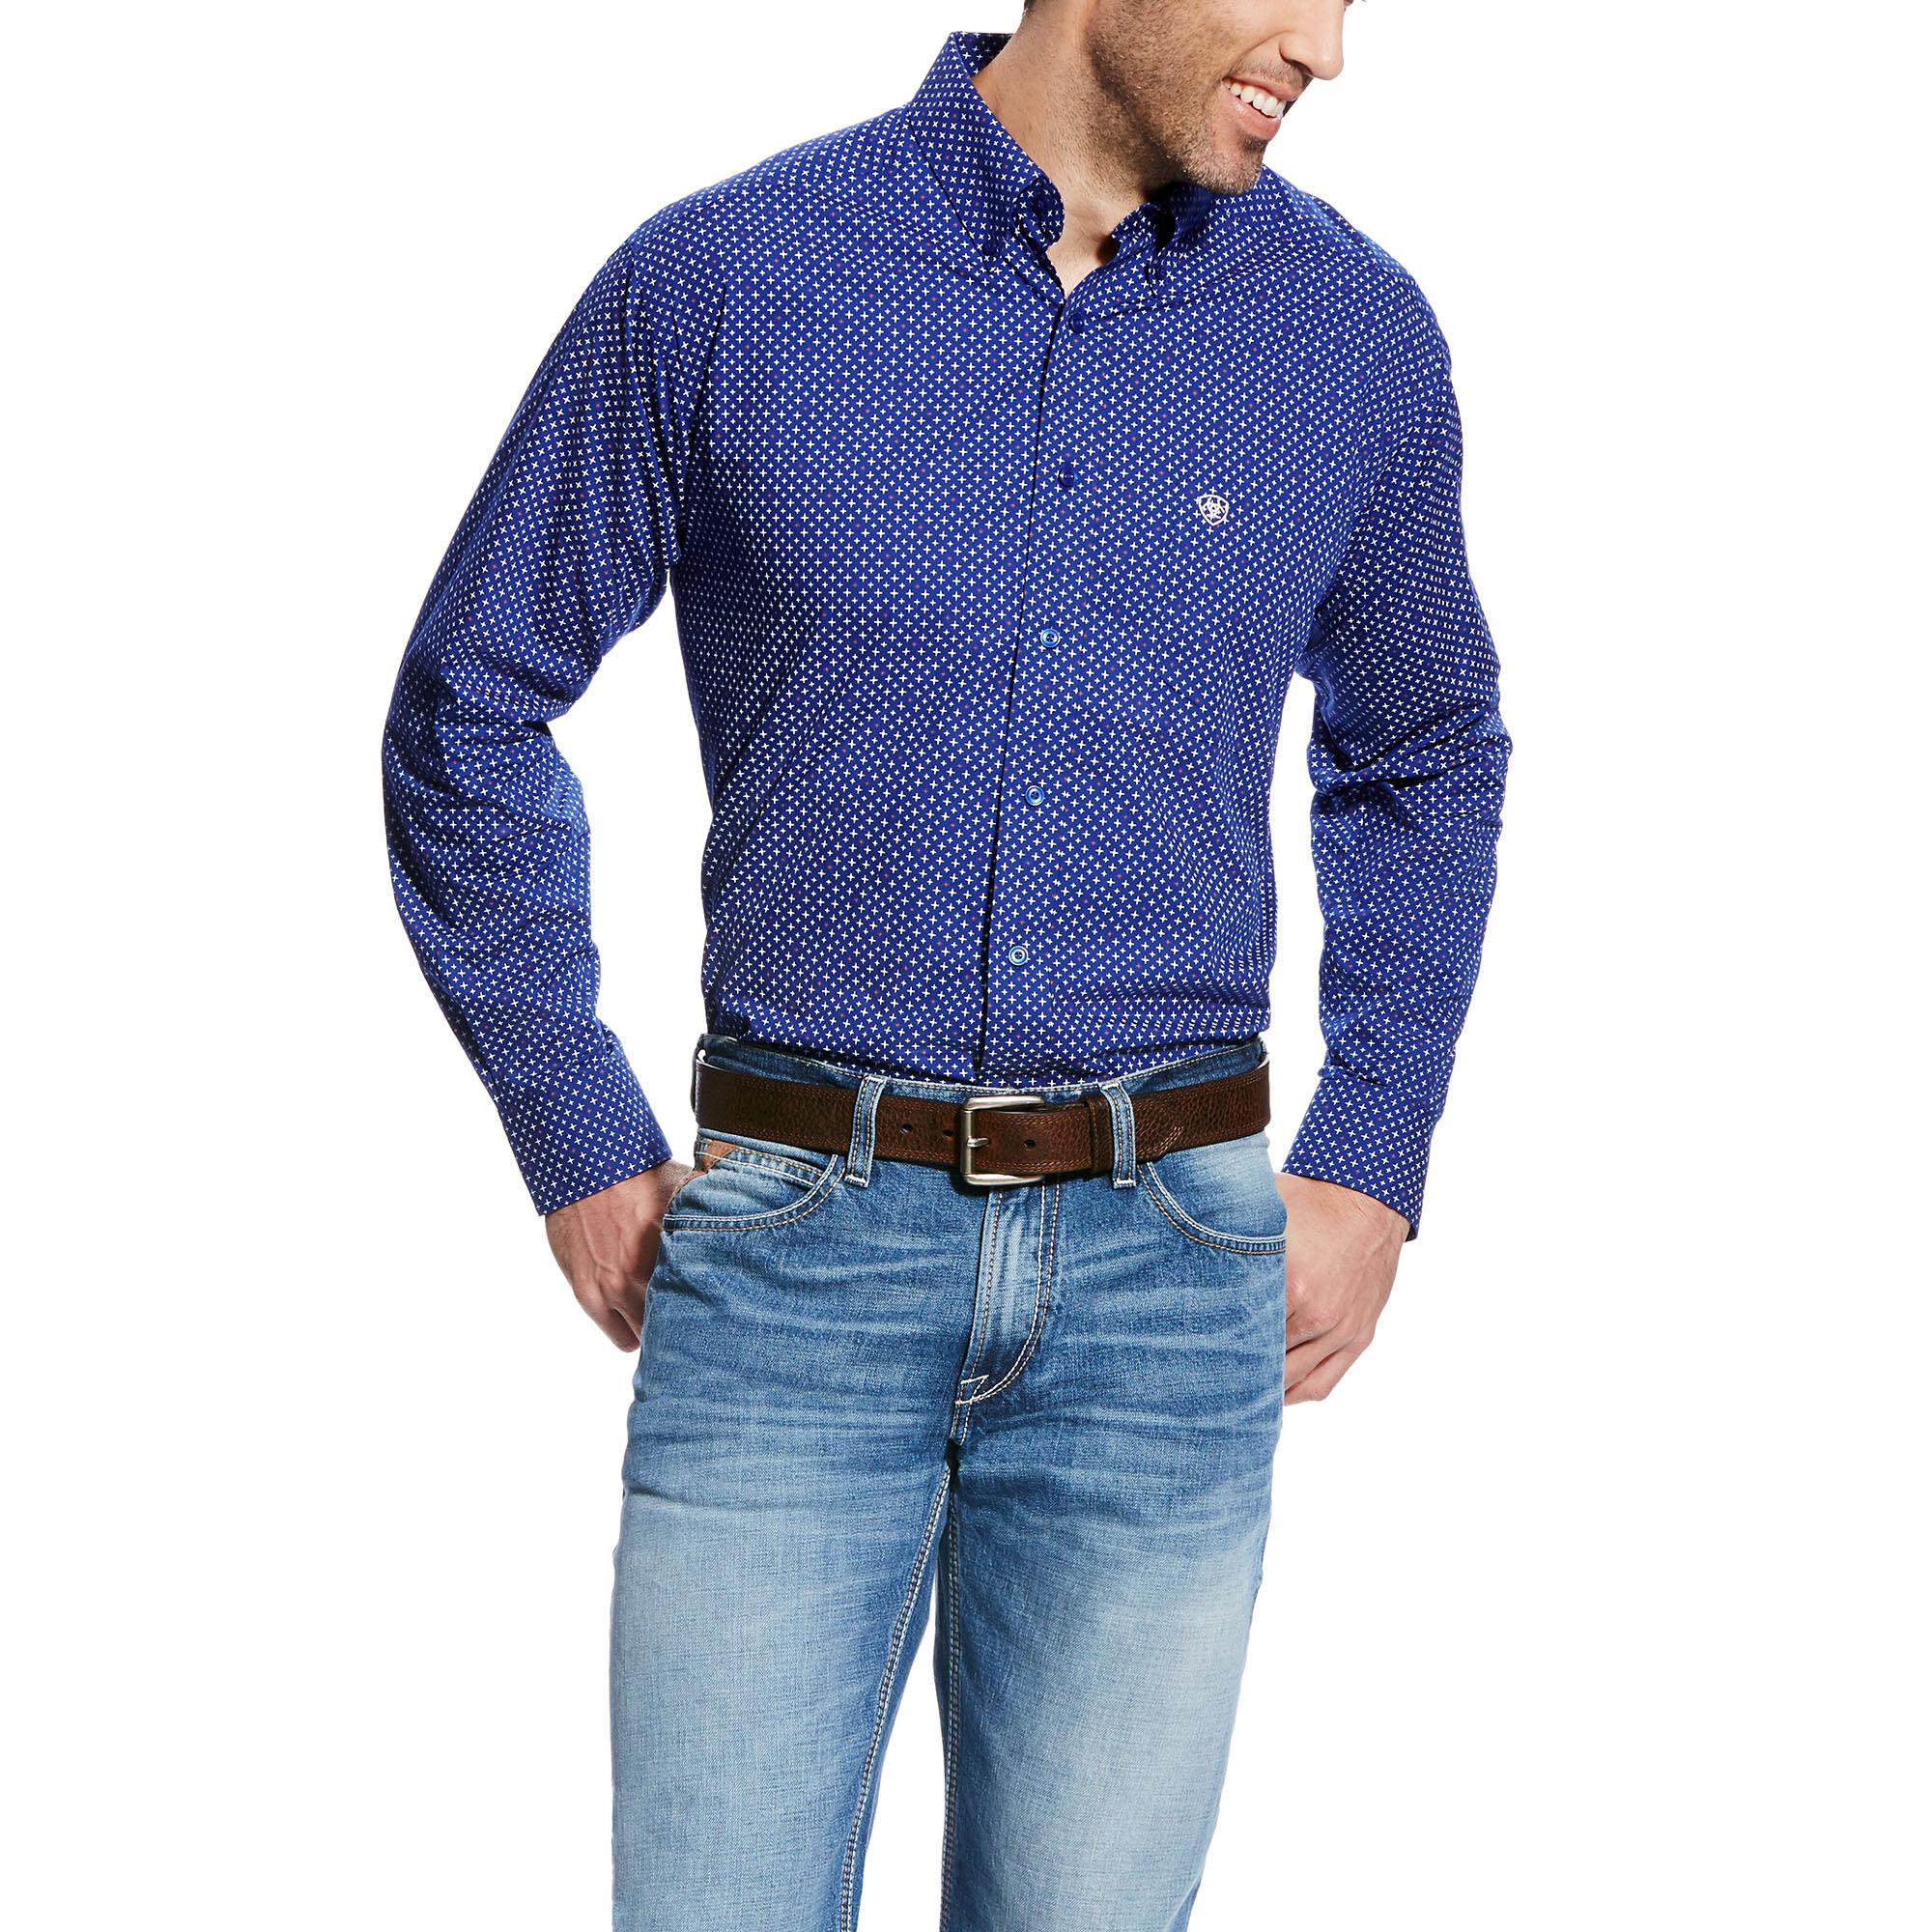 Doyle Shirt